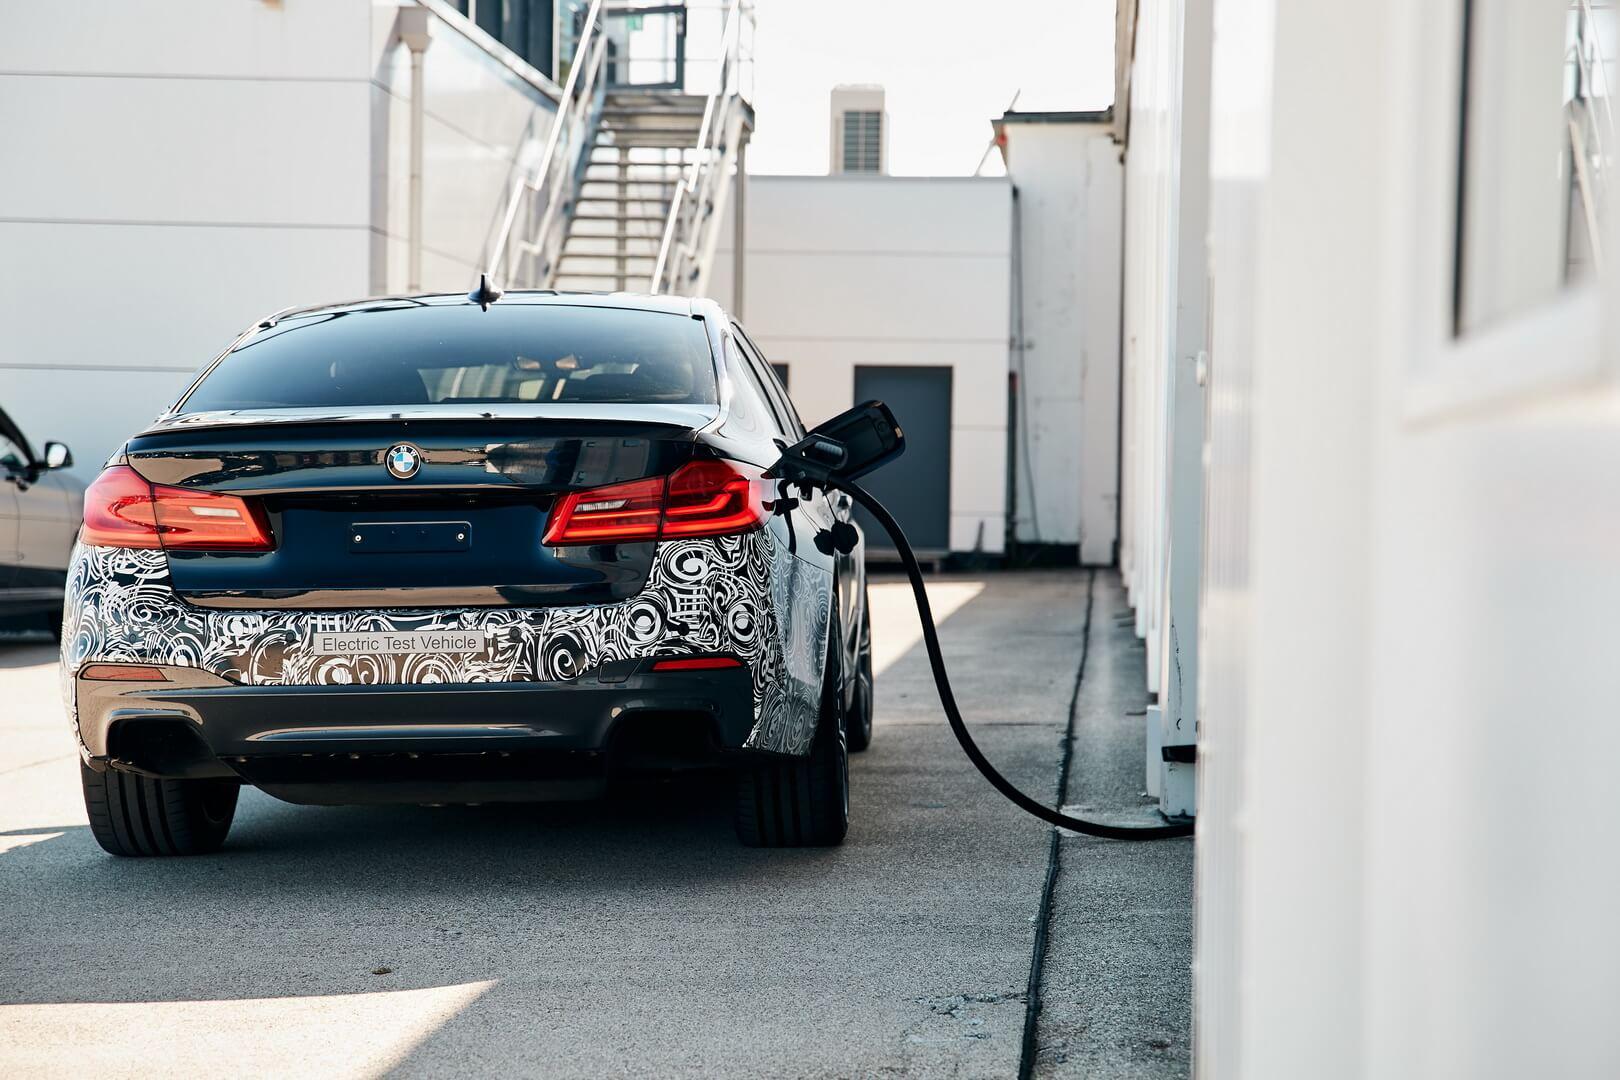 Электрический концепт BMW Power BEV на зарядке